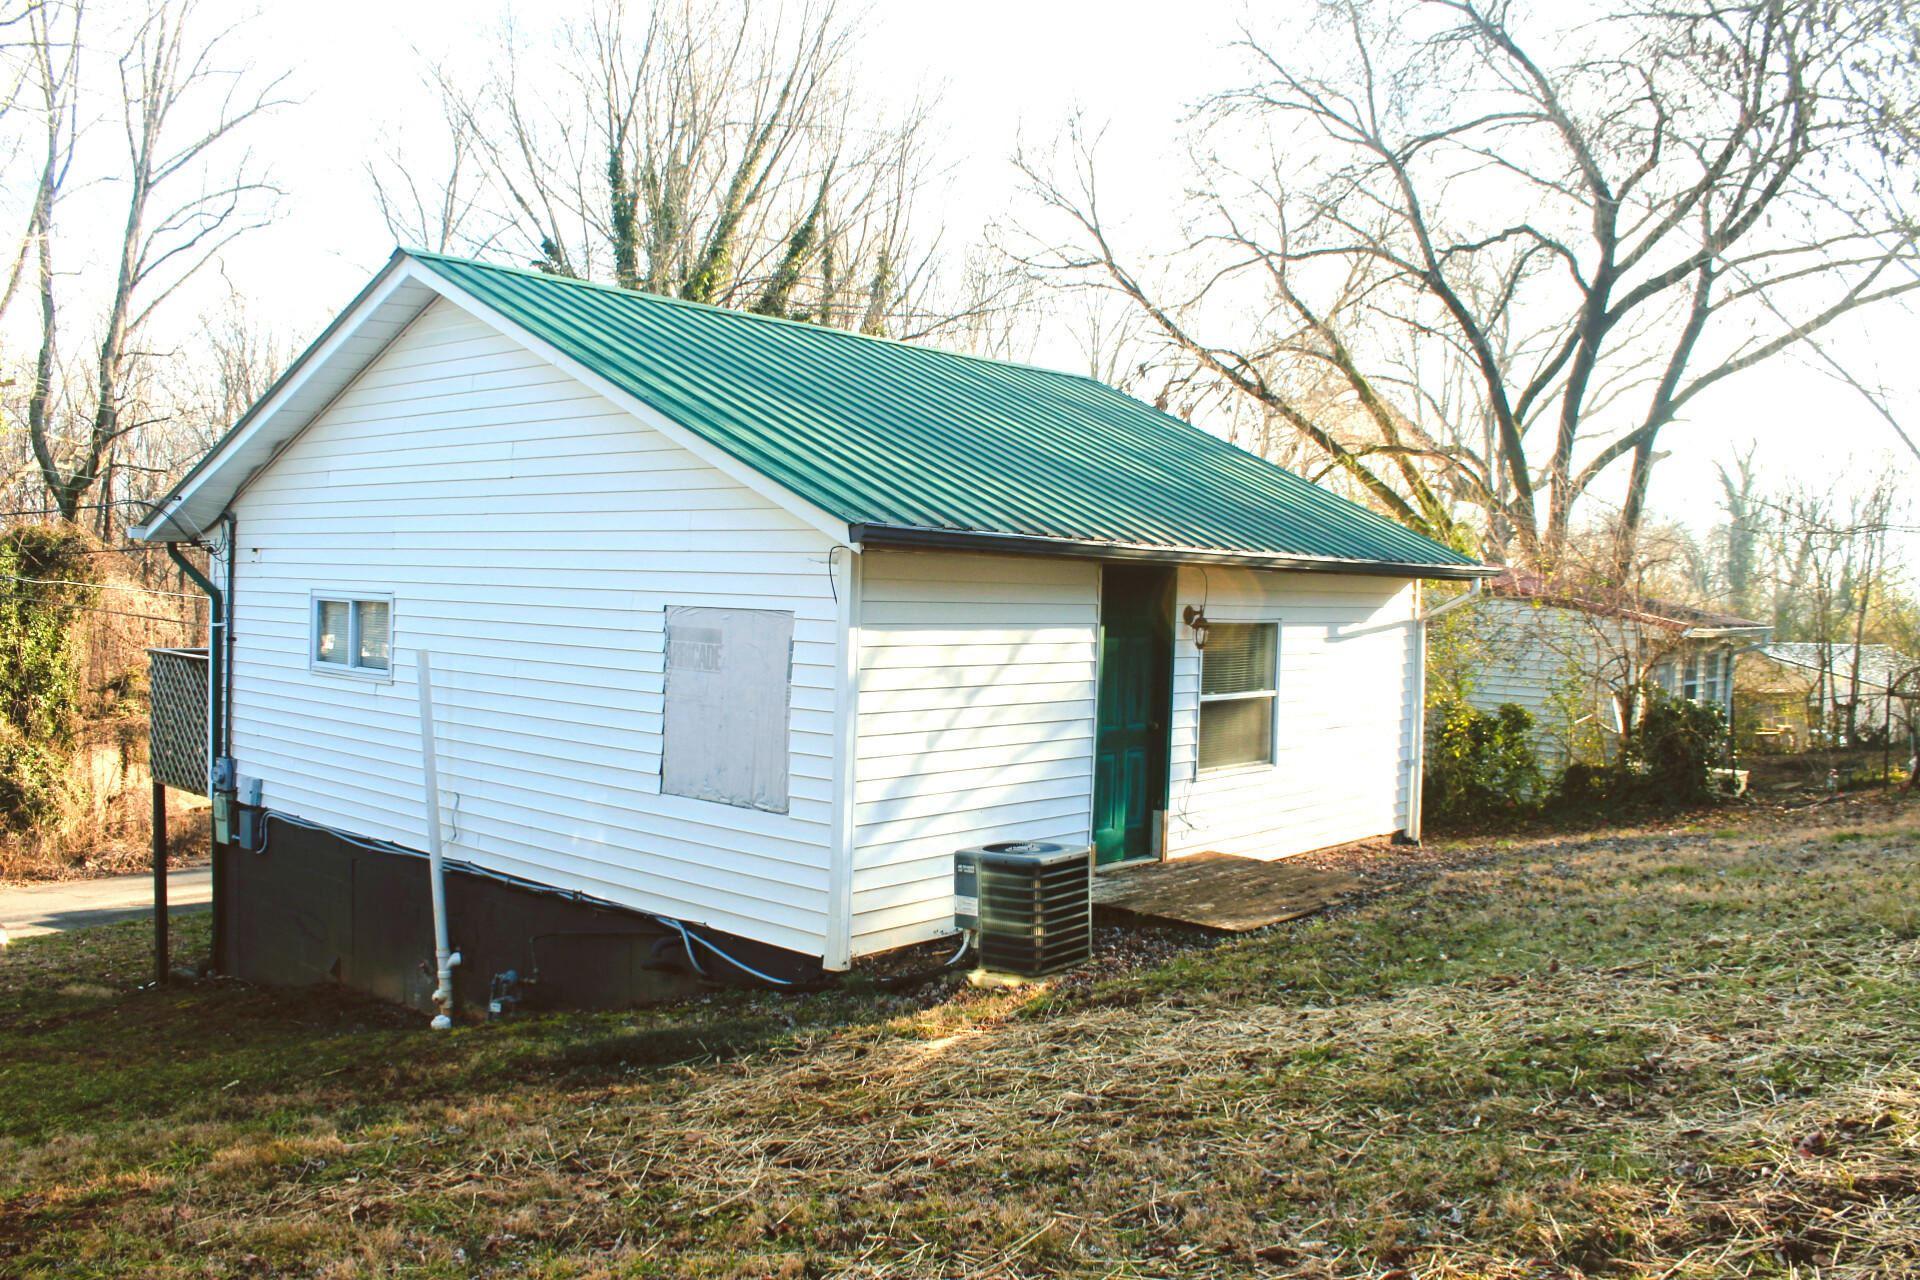 Photo of 124 E Wadsworth Circle, Oak Ridge, TN 37830 (MLS # 1140080)